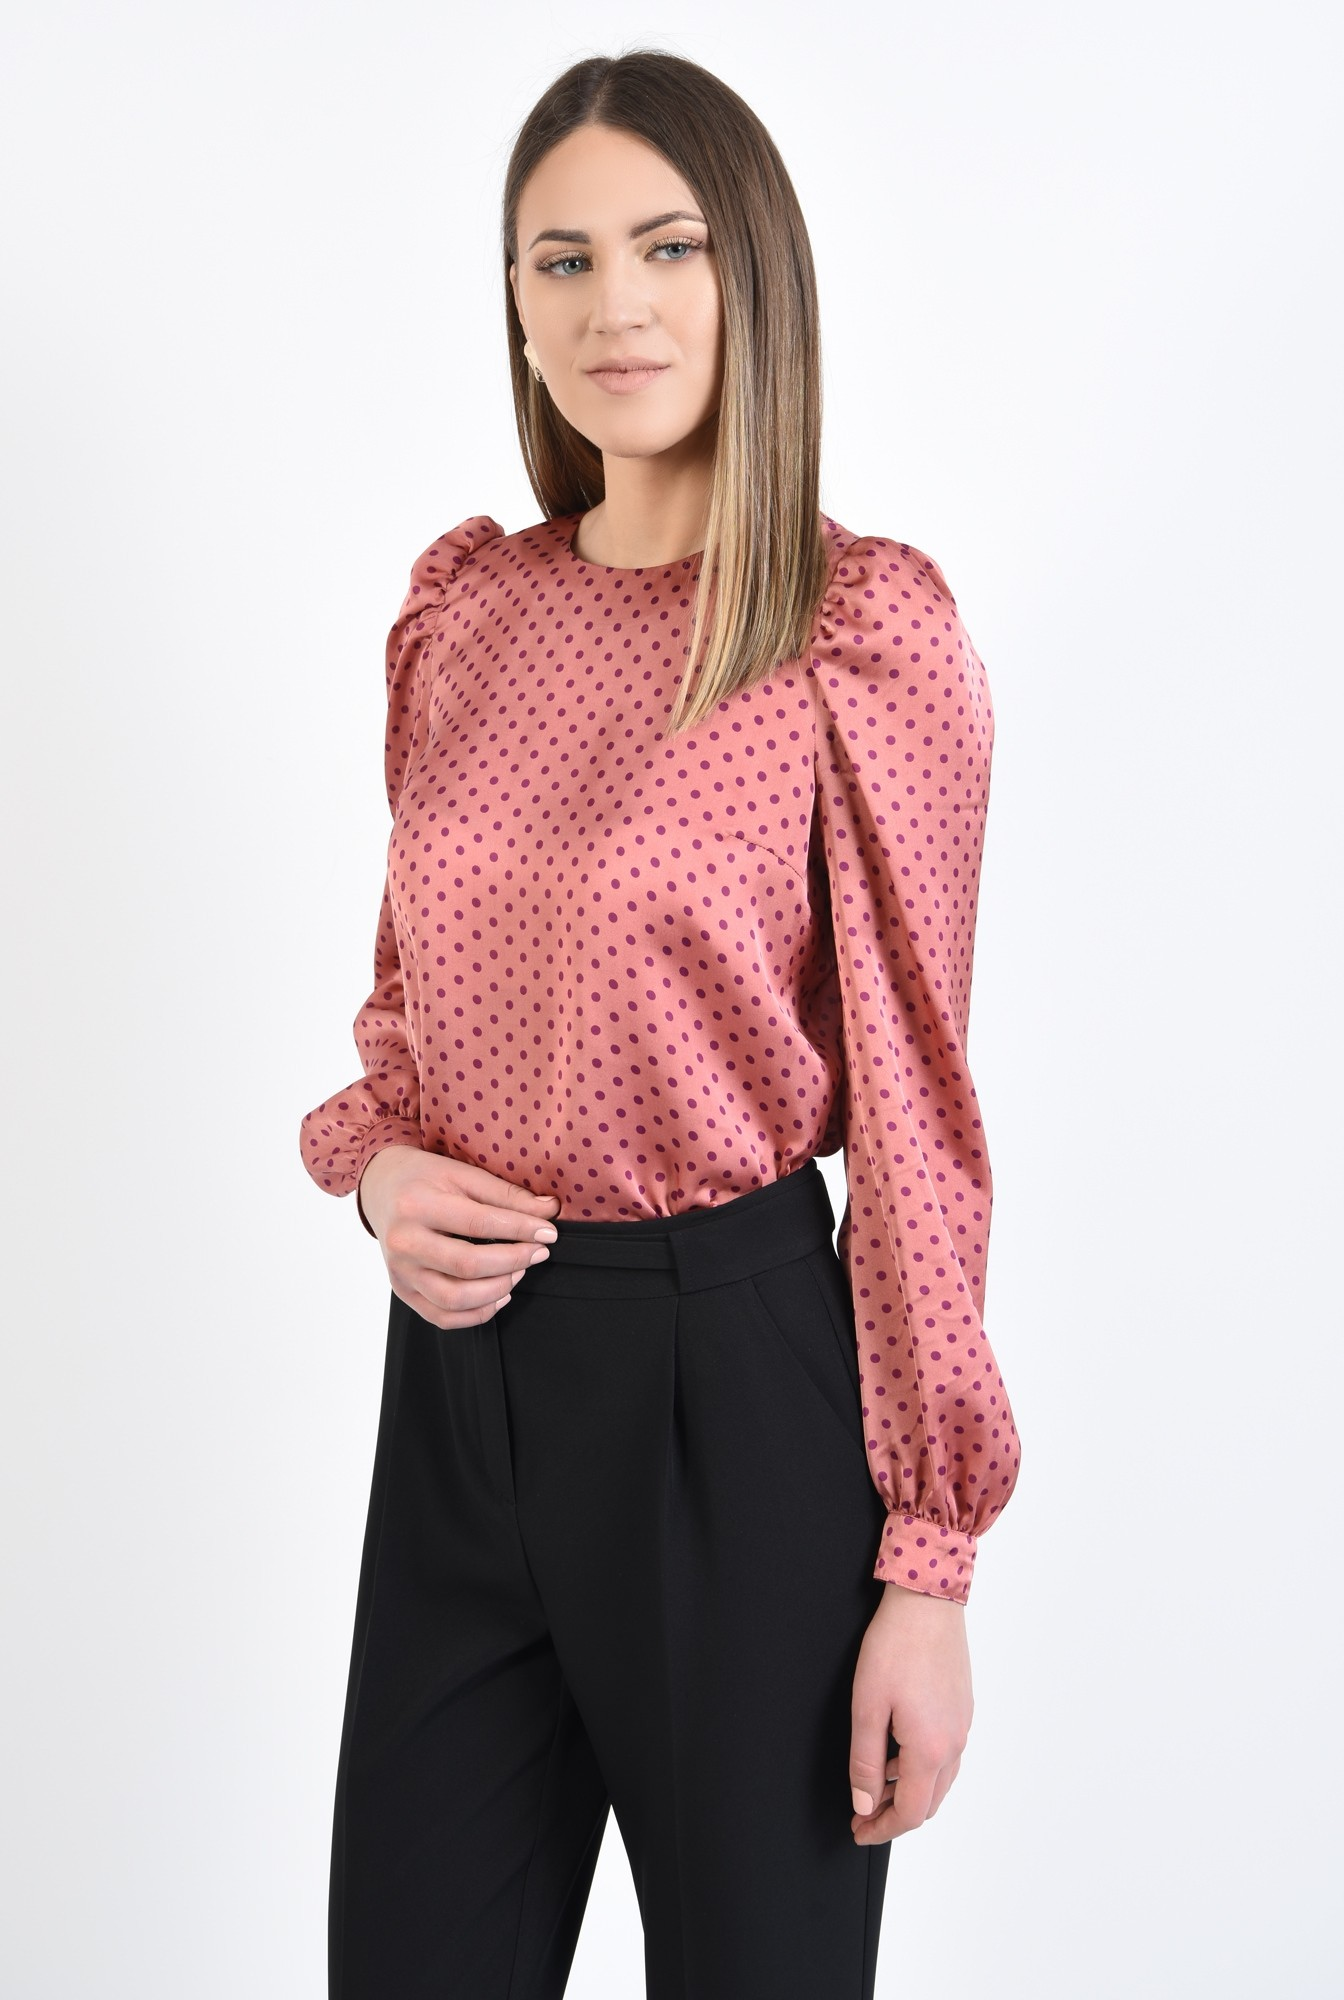 0 - 360 - bluza cu picouri, din satin roz, maneci lungi, croi drept, buline